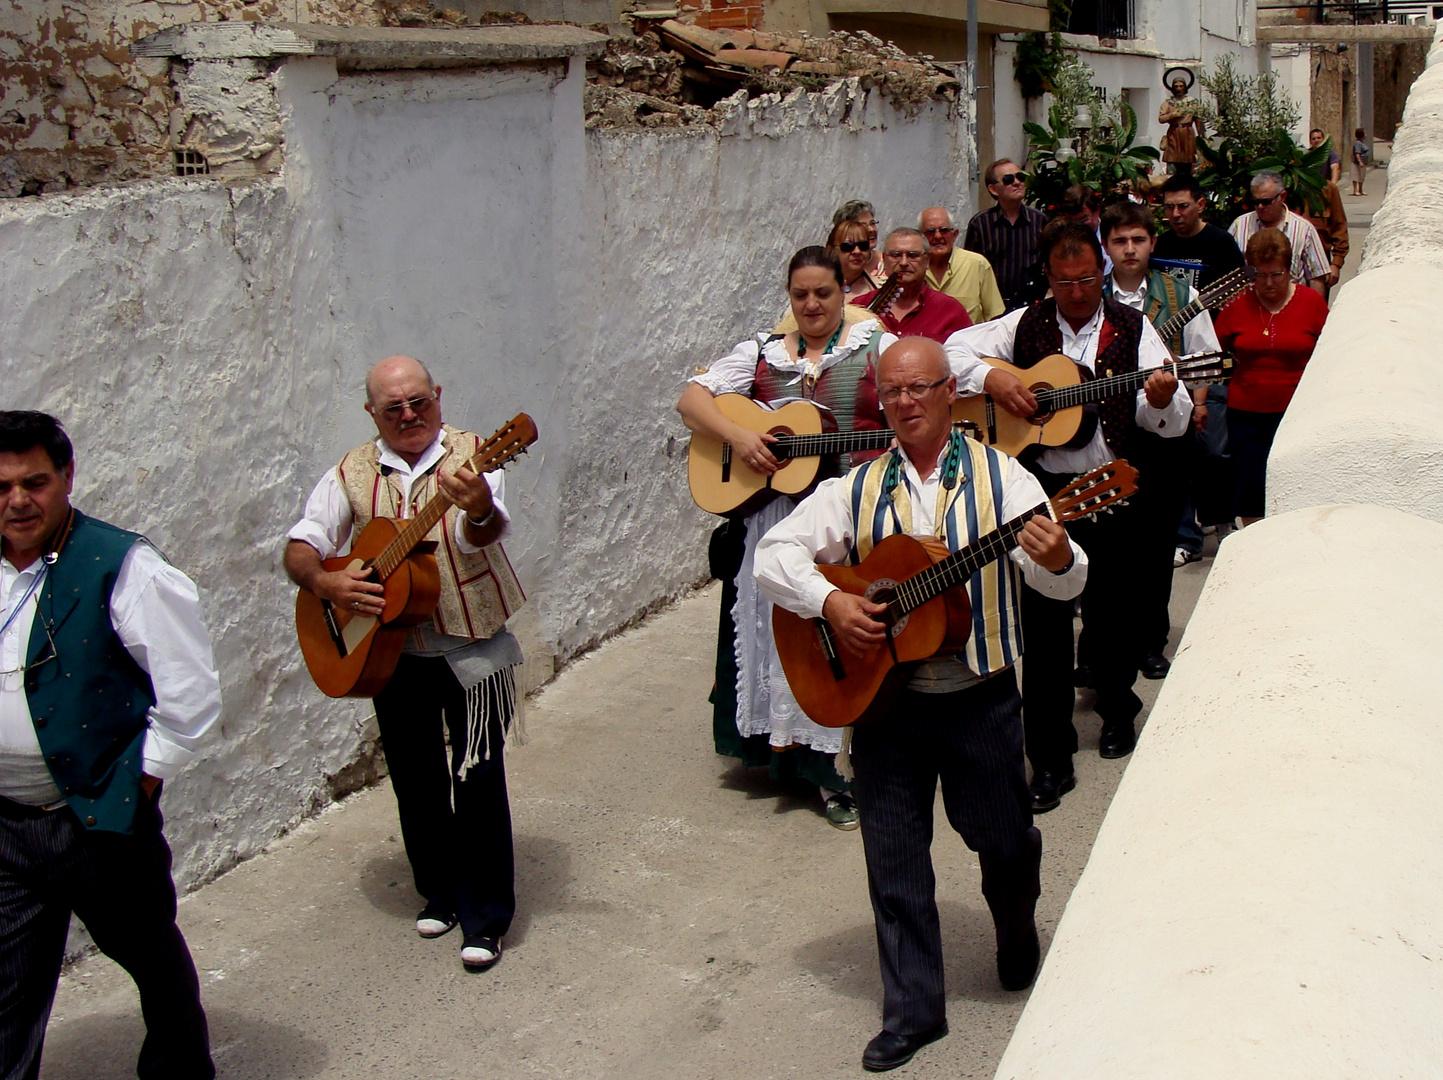 Calles et la fête de Sta. Quiteria..04